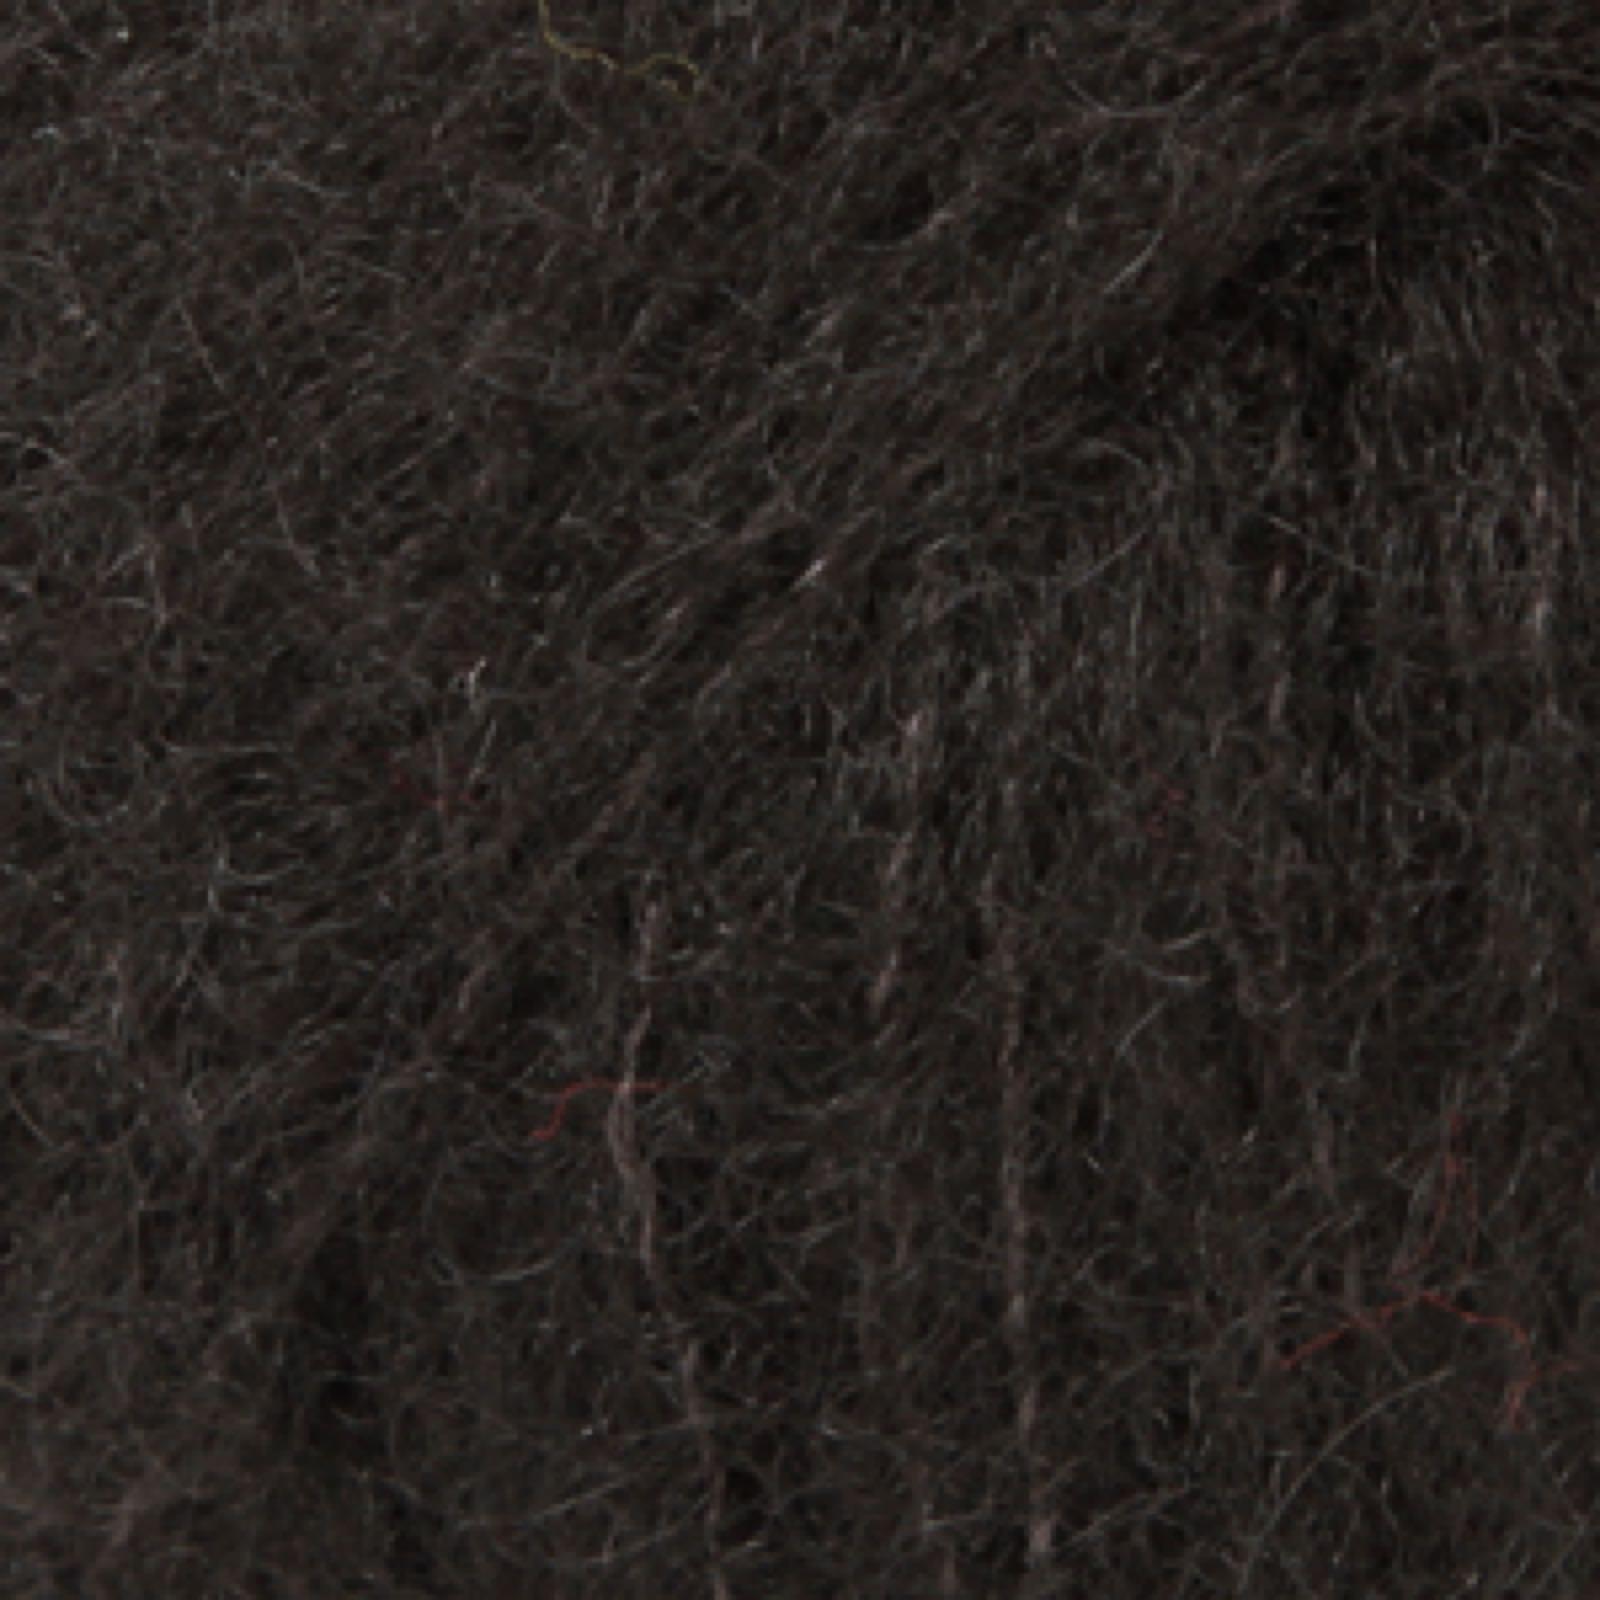 DROPS Brushed Alpaca Silk, uni colour 16 sort